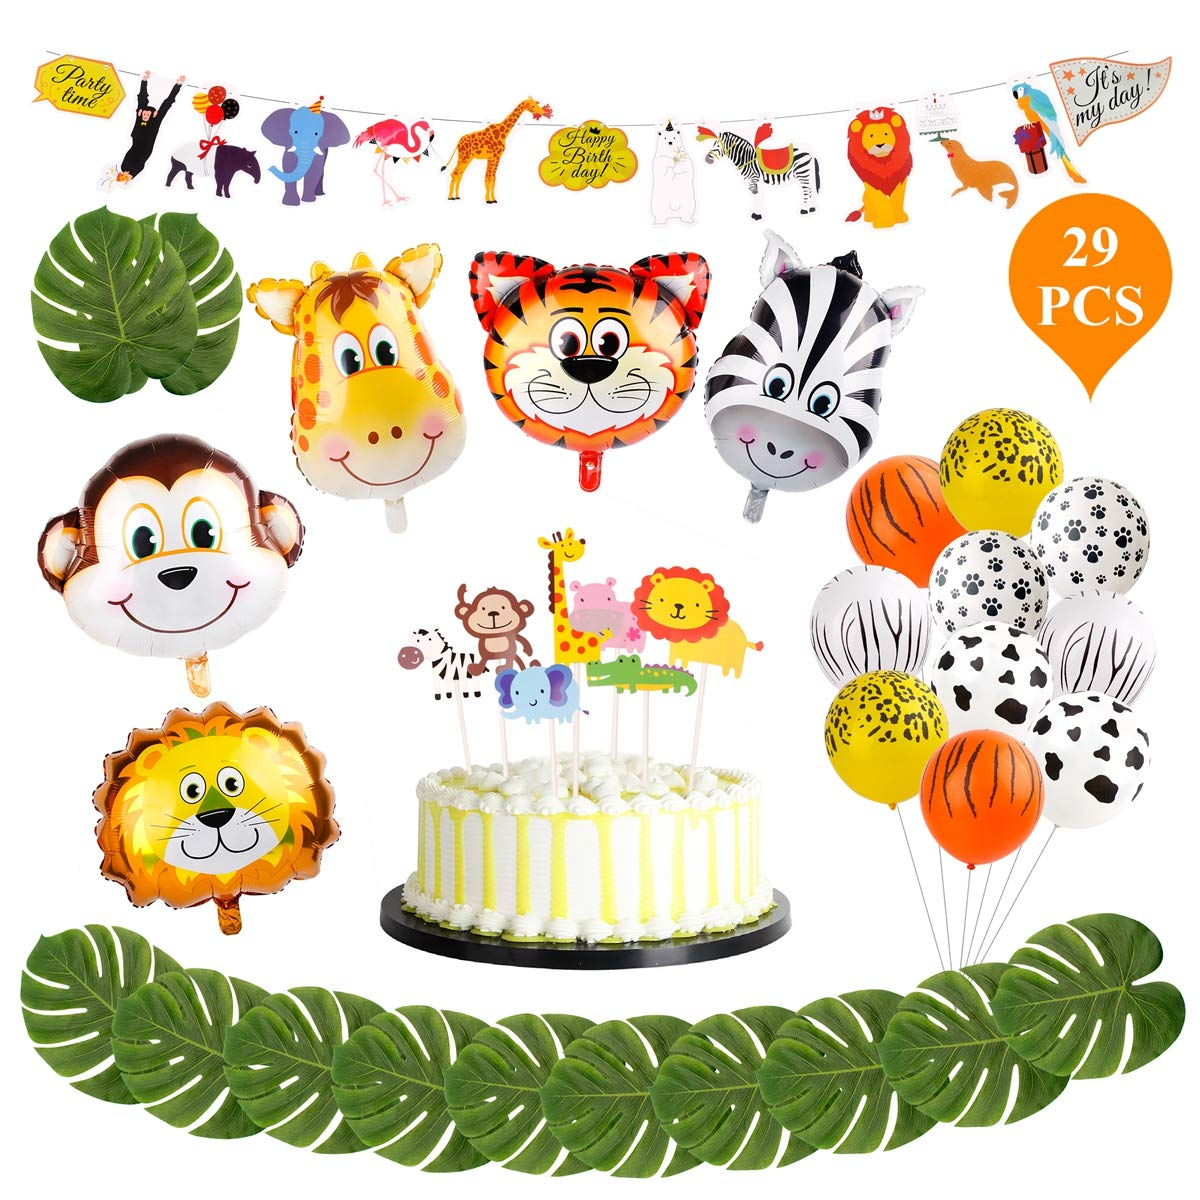 Animal balloon Safari Party Supplies - FengRise Jungle Theme Balloon Party Decoration Pack of 29, Jumbo Animal Head Balloons Latex Print Balloon and Safari Banner for Birthday Party/Theme Party.